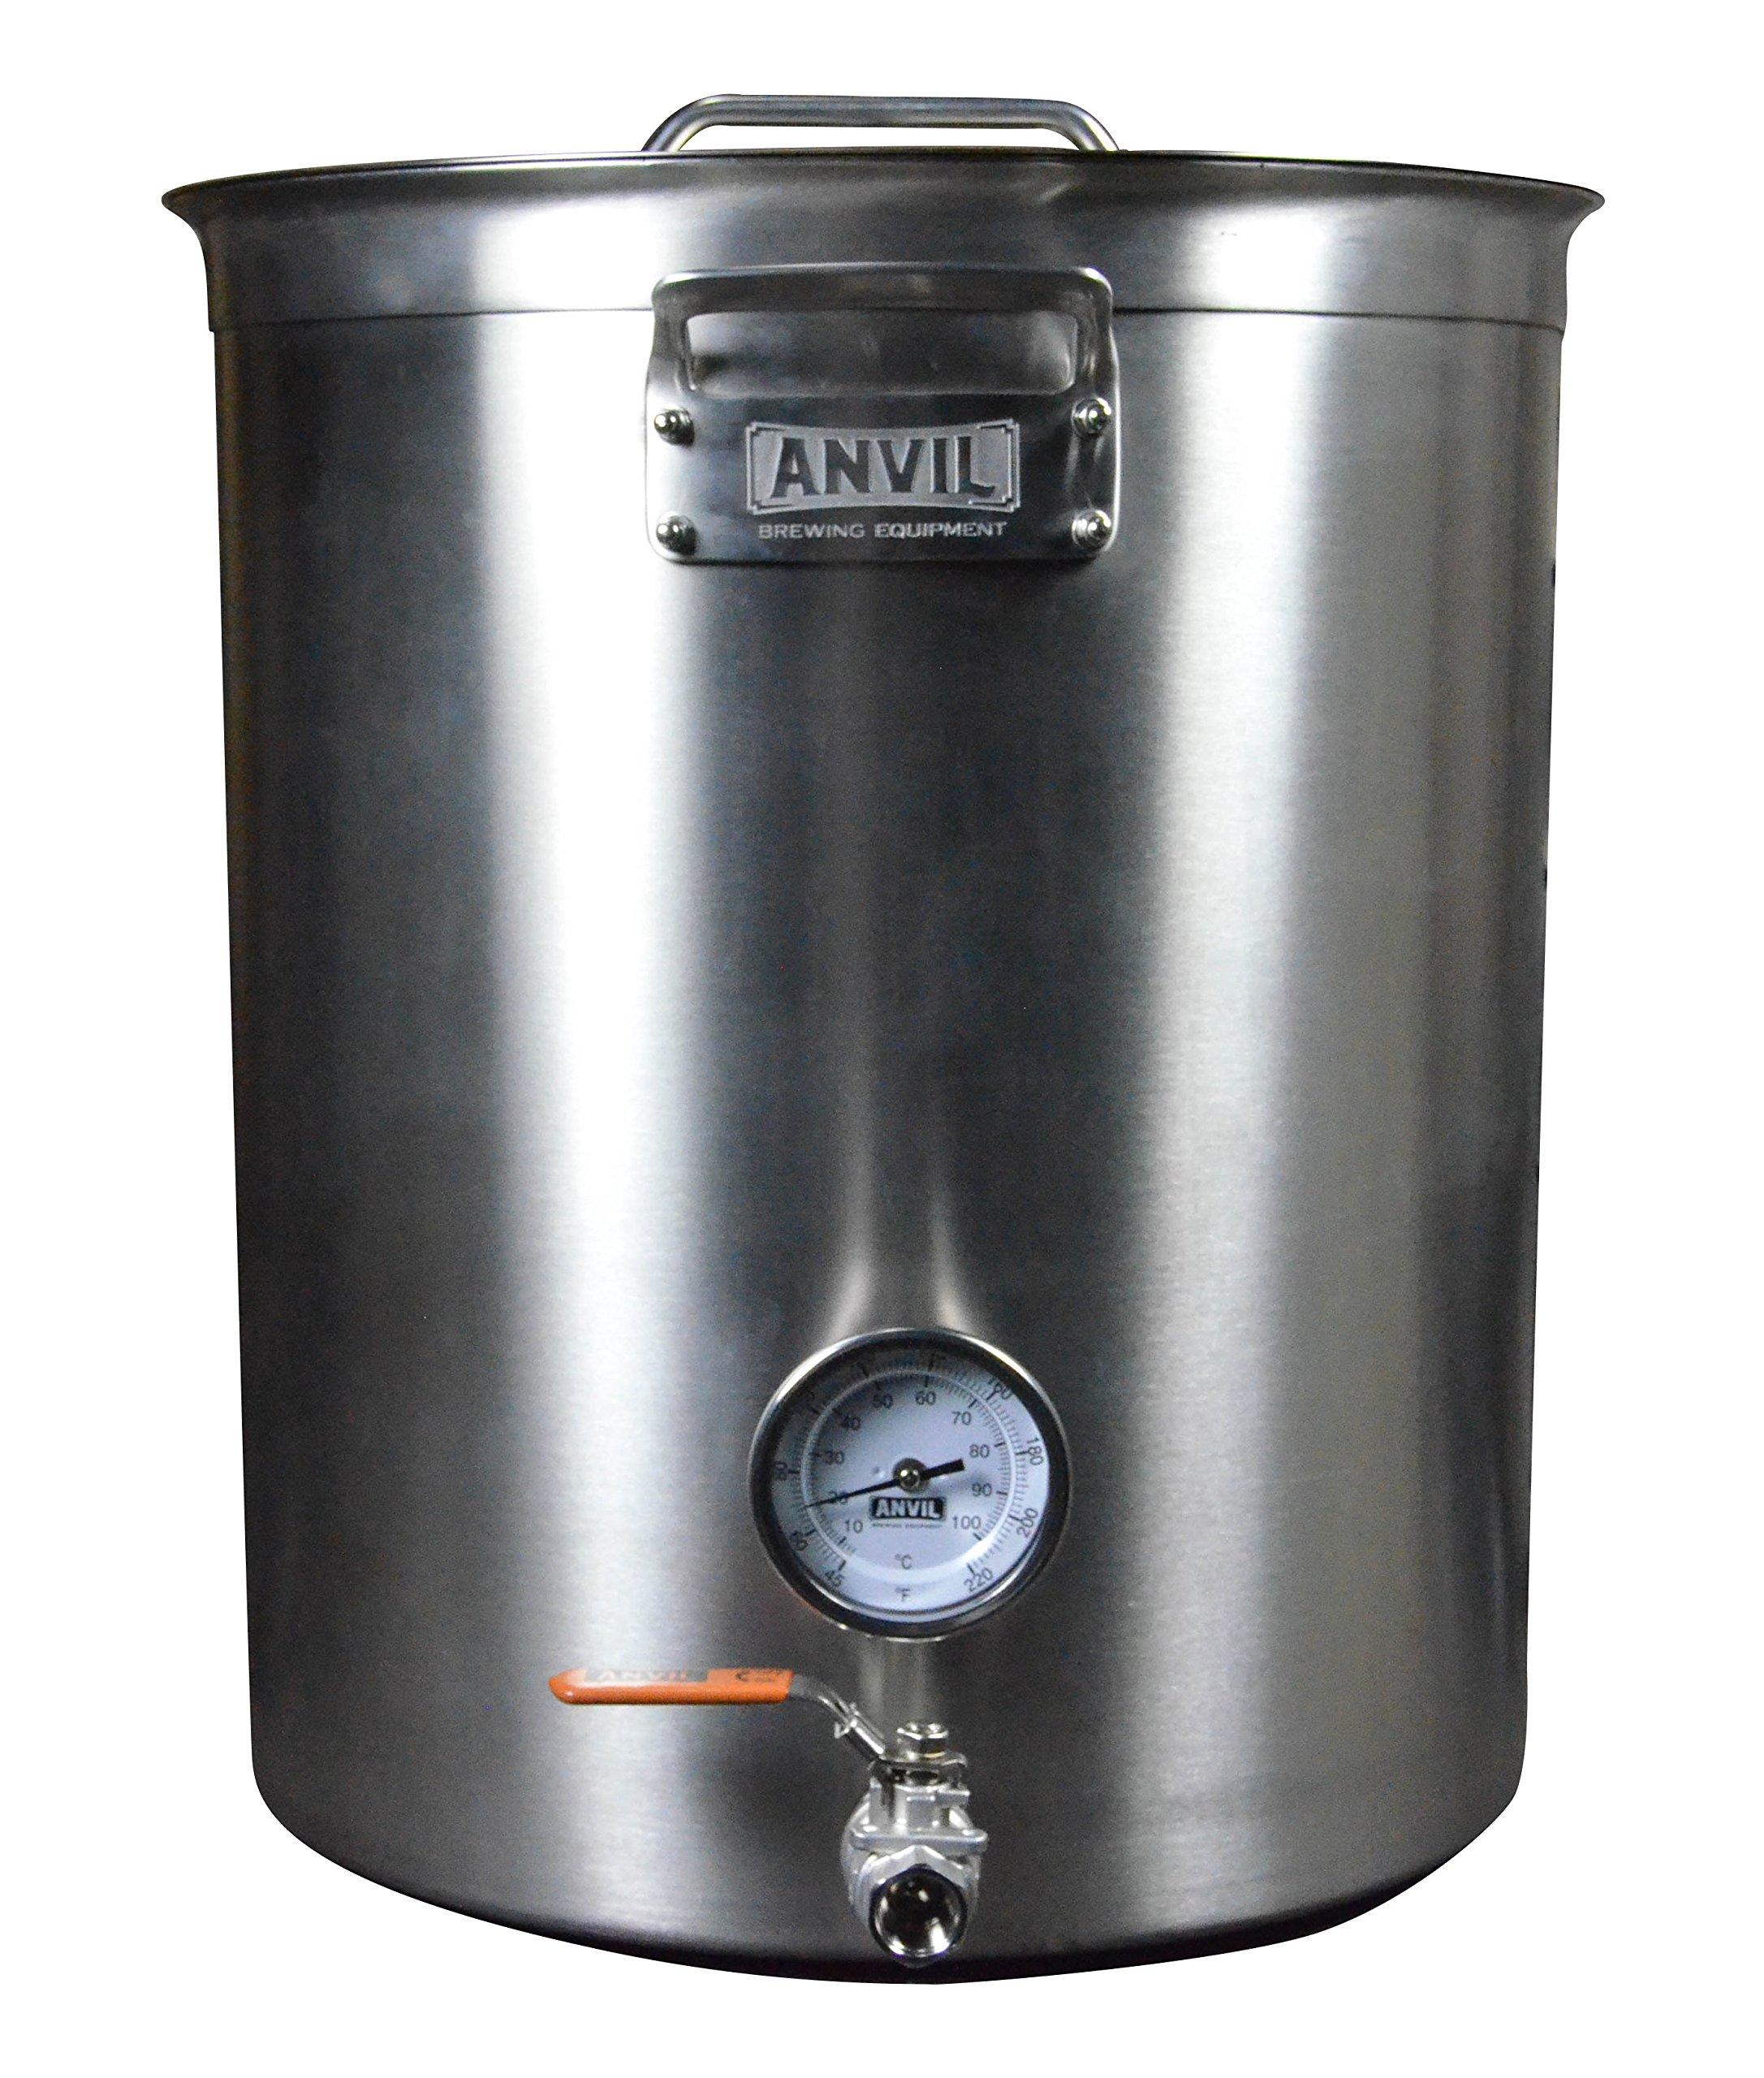 Anvil Brew Kettle, 20 gal